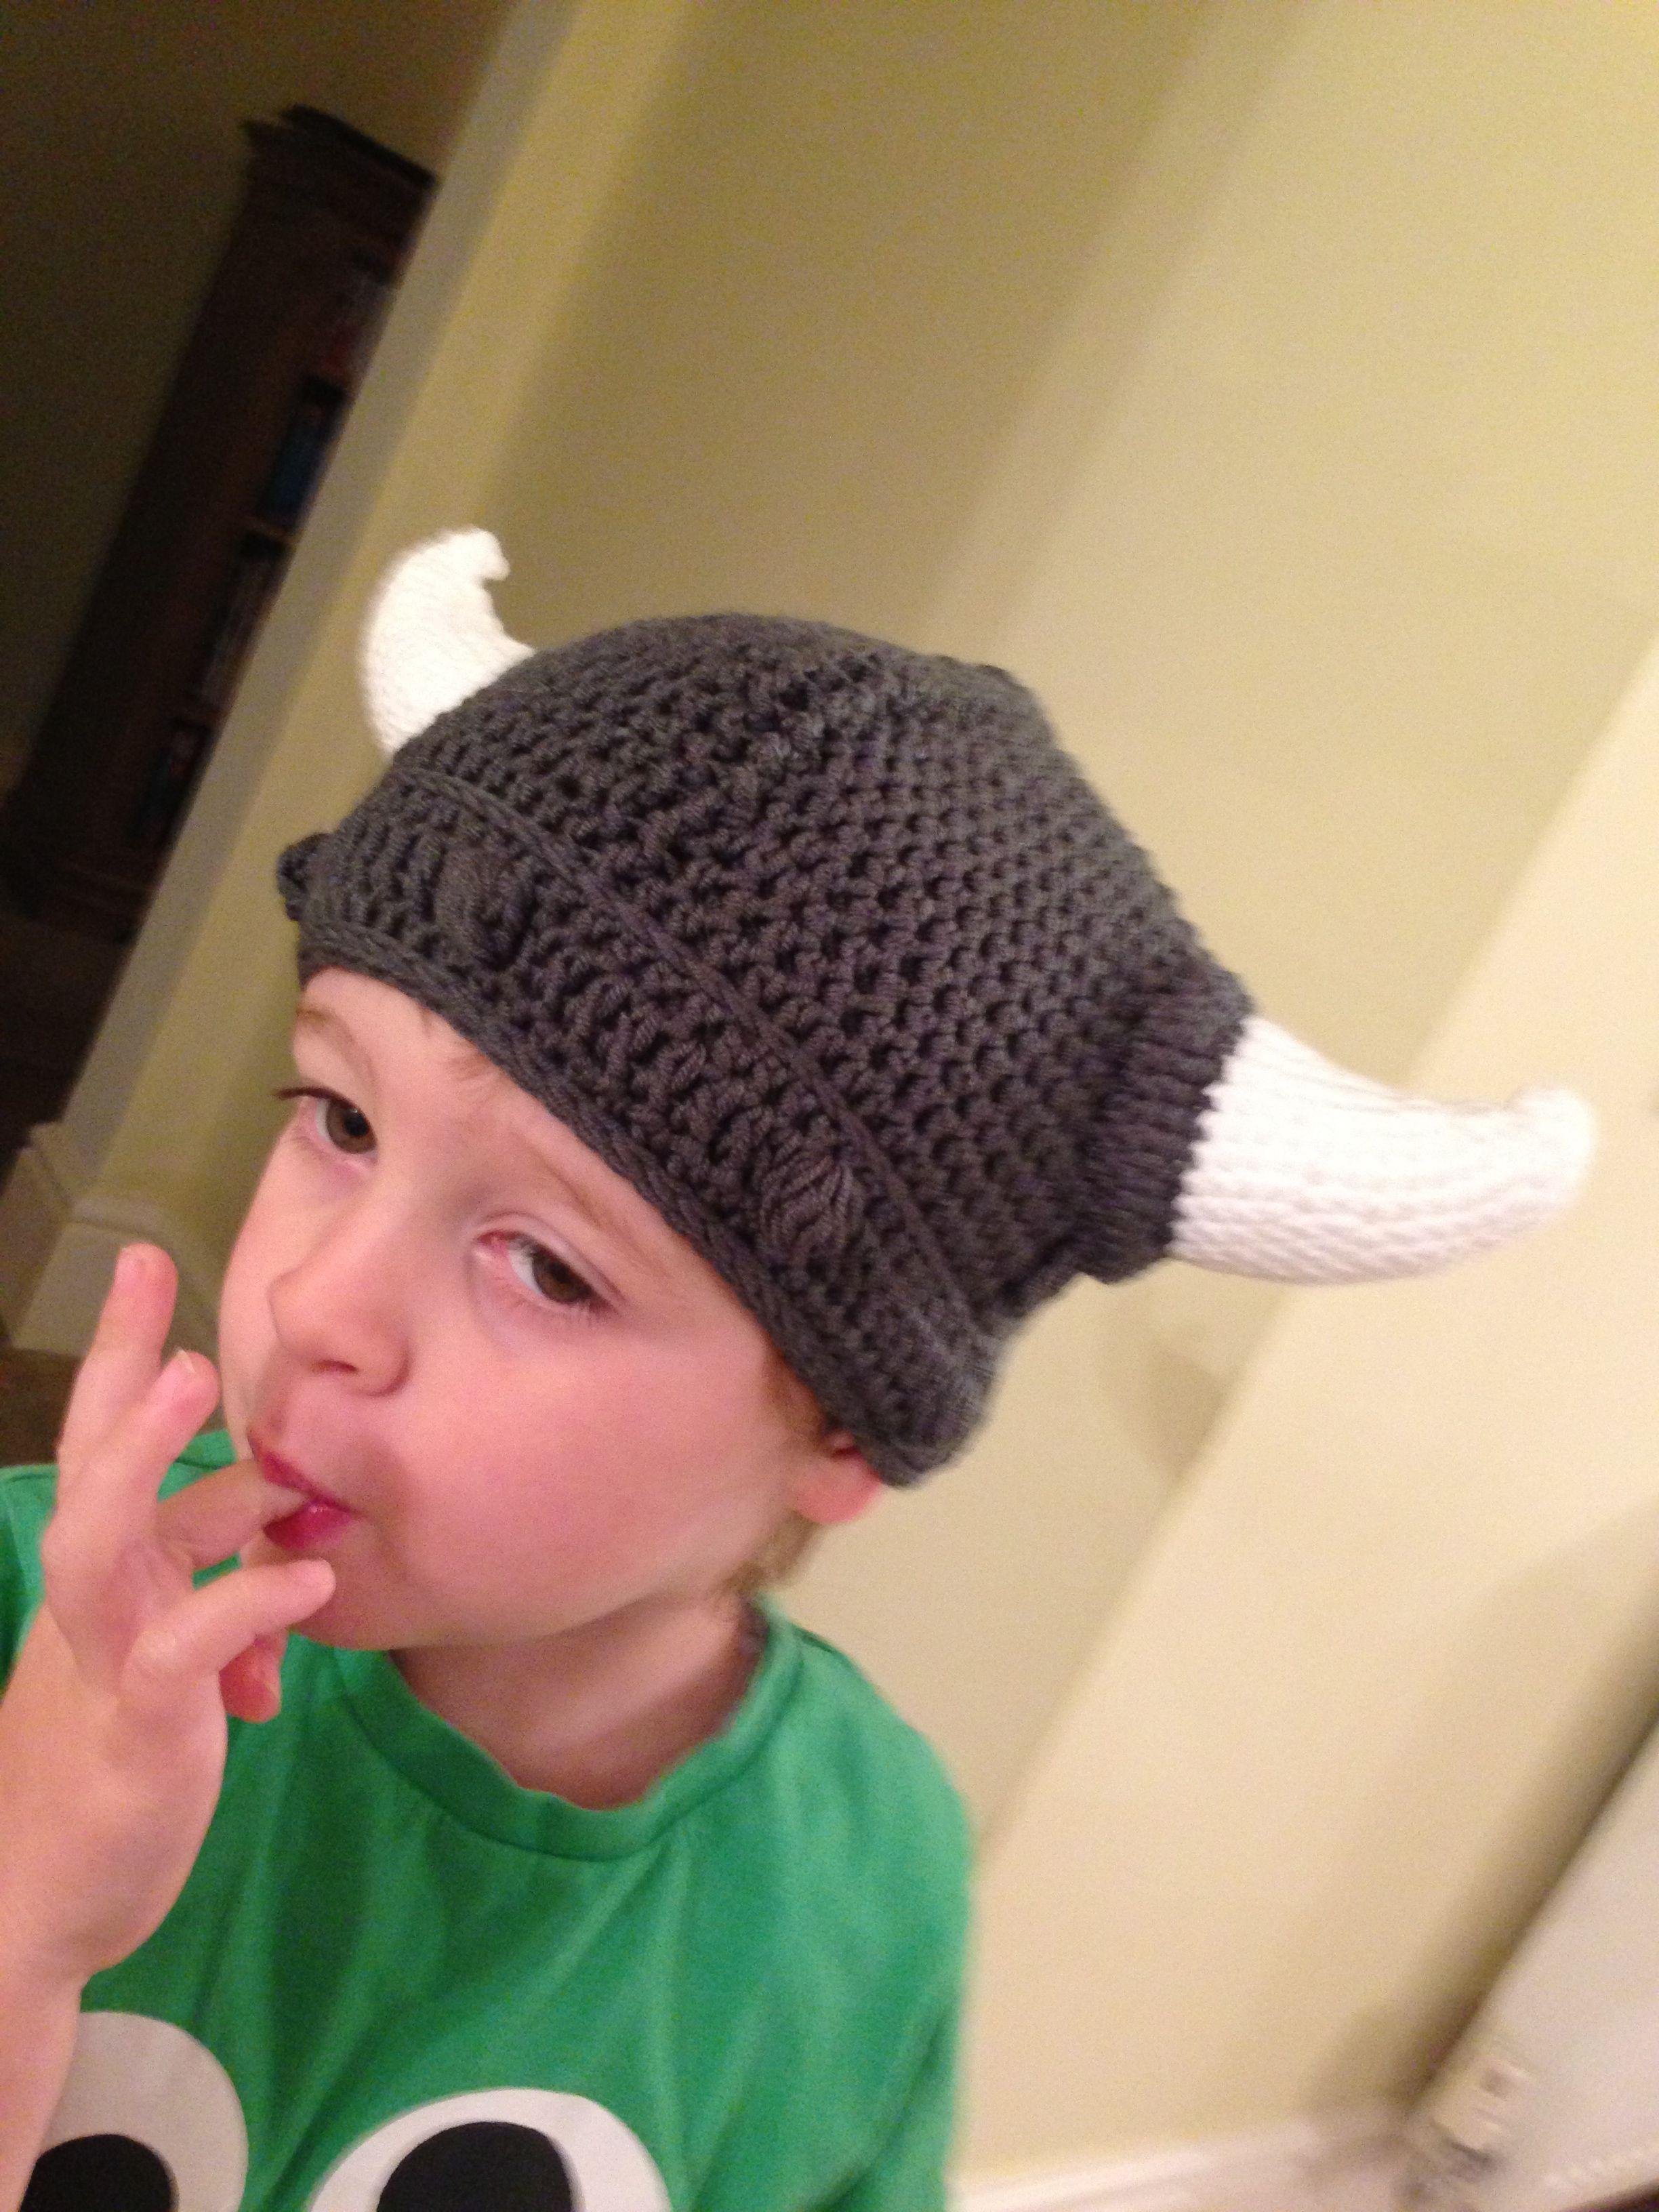 Crochet Viking Hat : Crochet Viking hat! Yarny To-Do List Pinterest